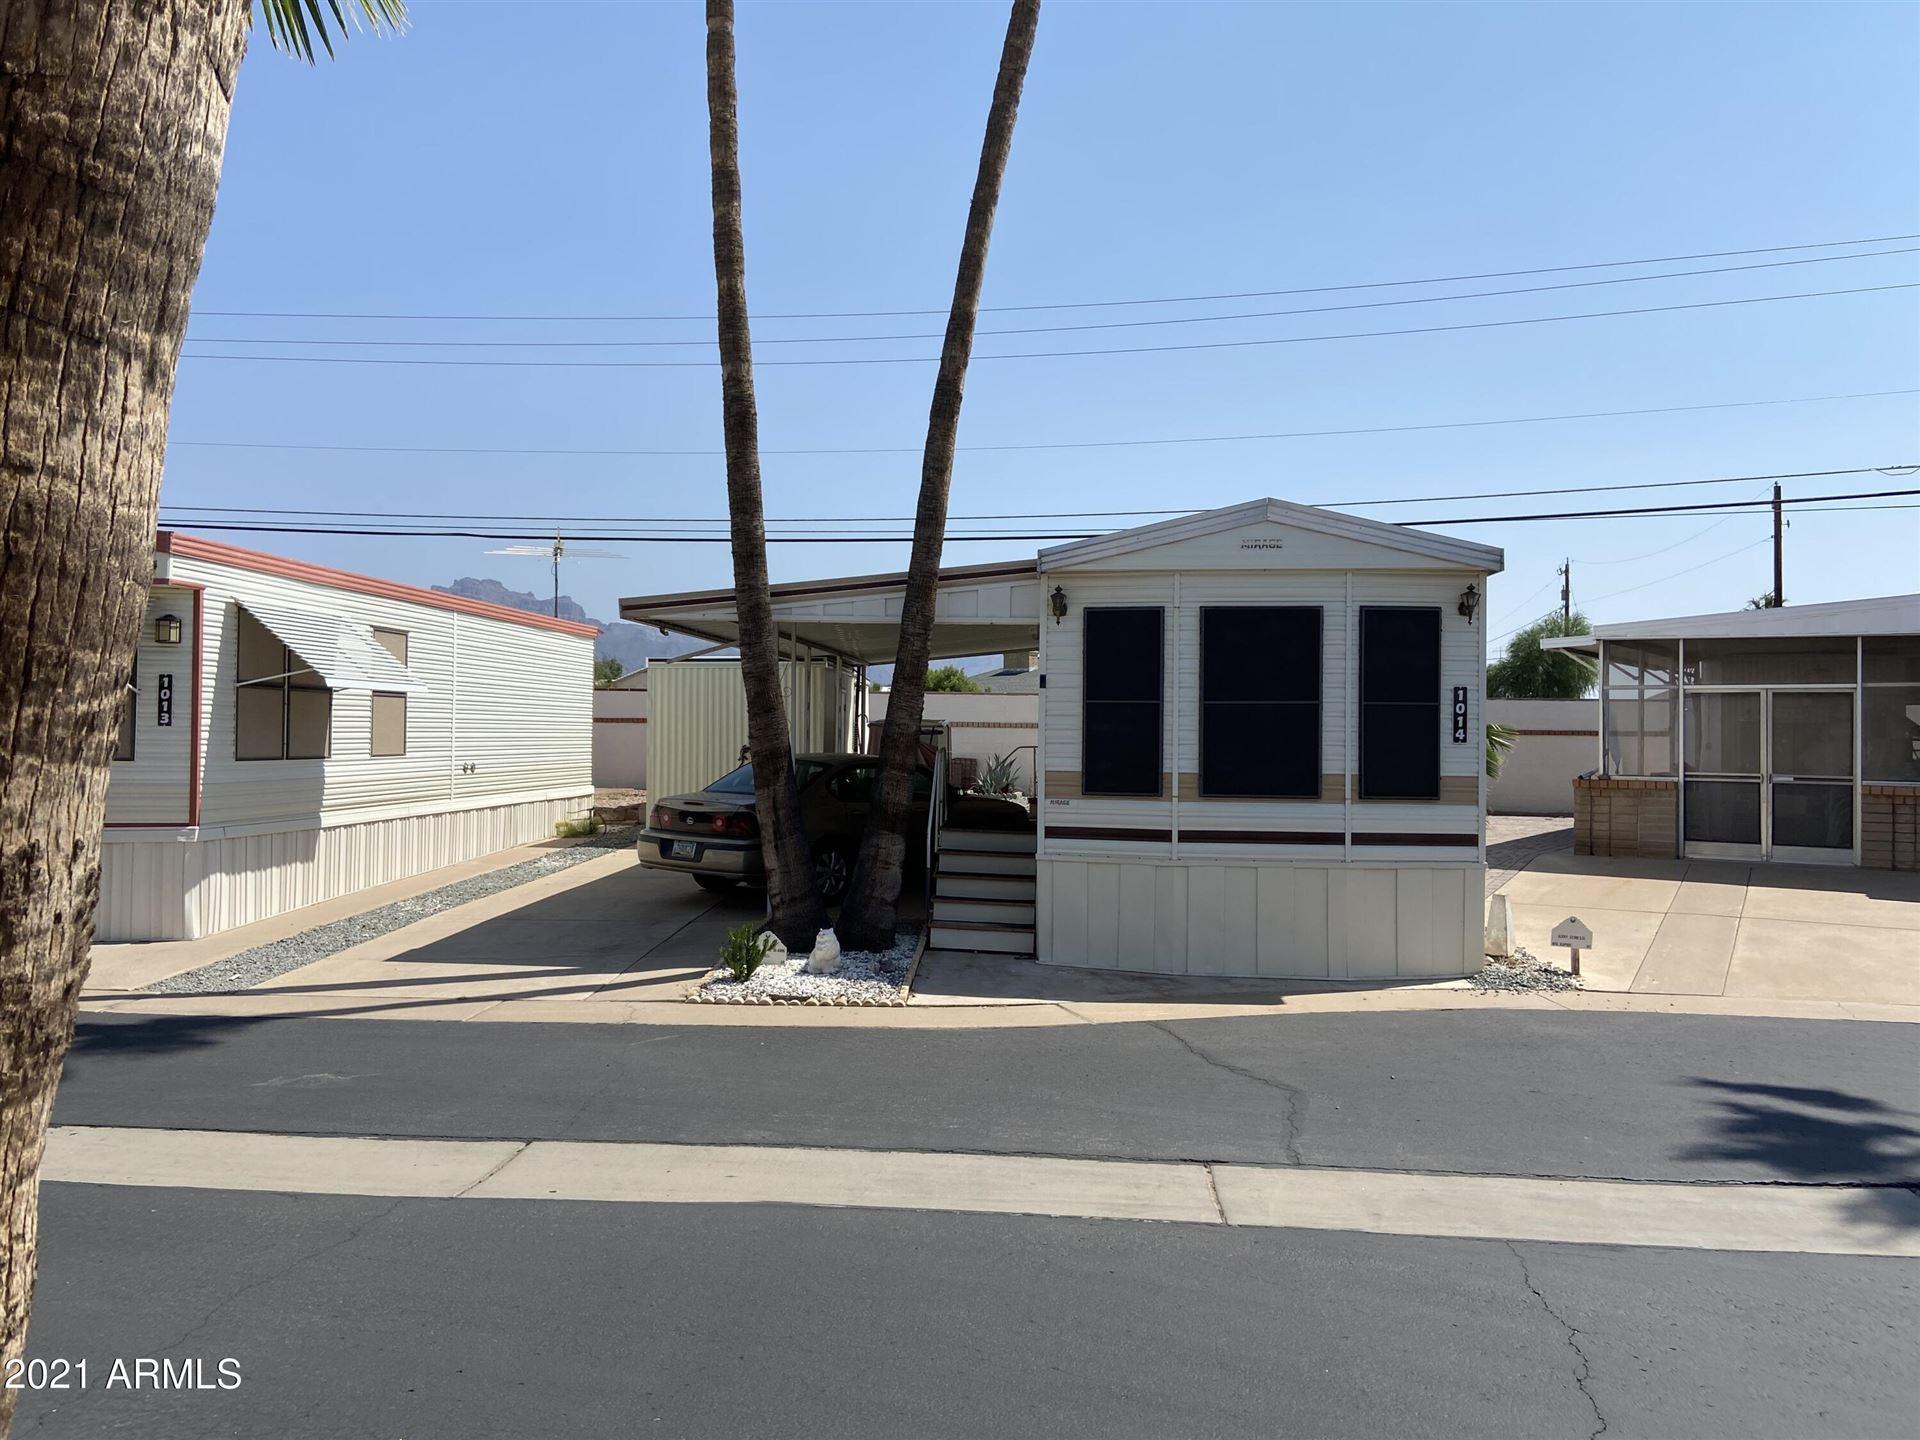 Photo of 1014 S KIOWA Circle, Apache Junction, AZ 85119 (MLS # 6290842)